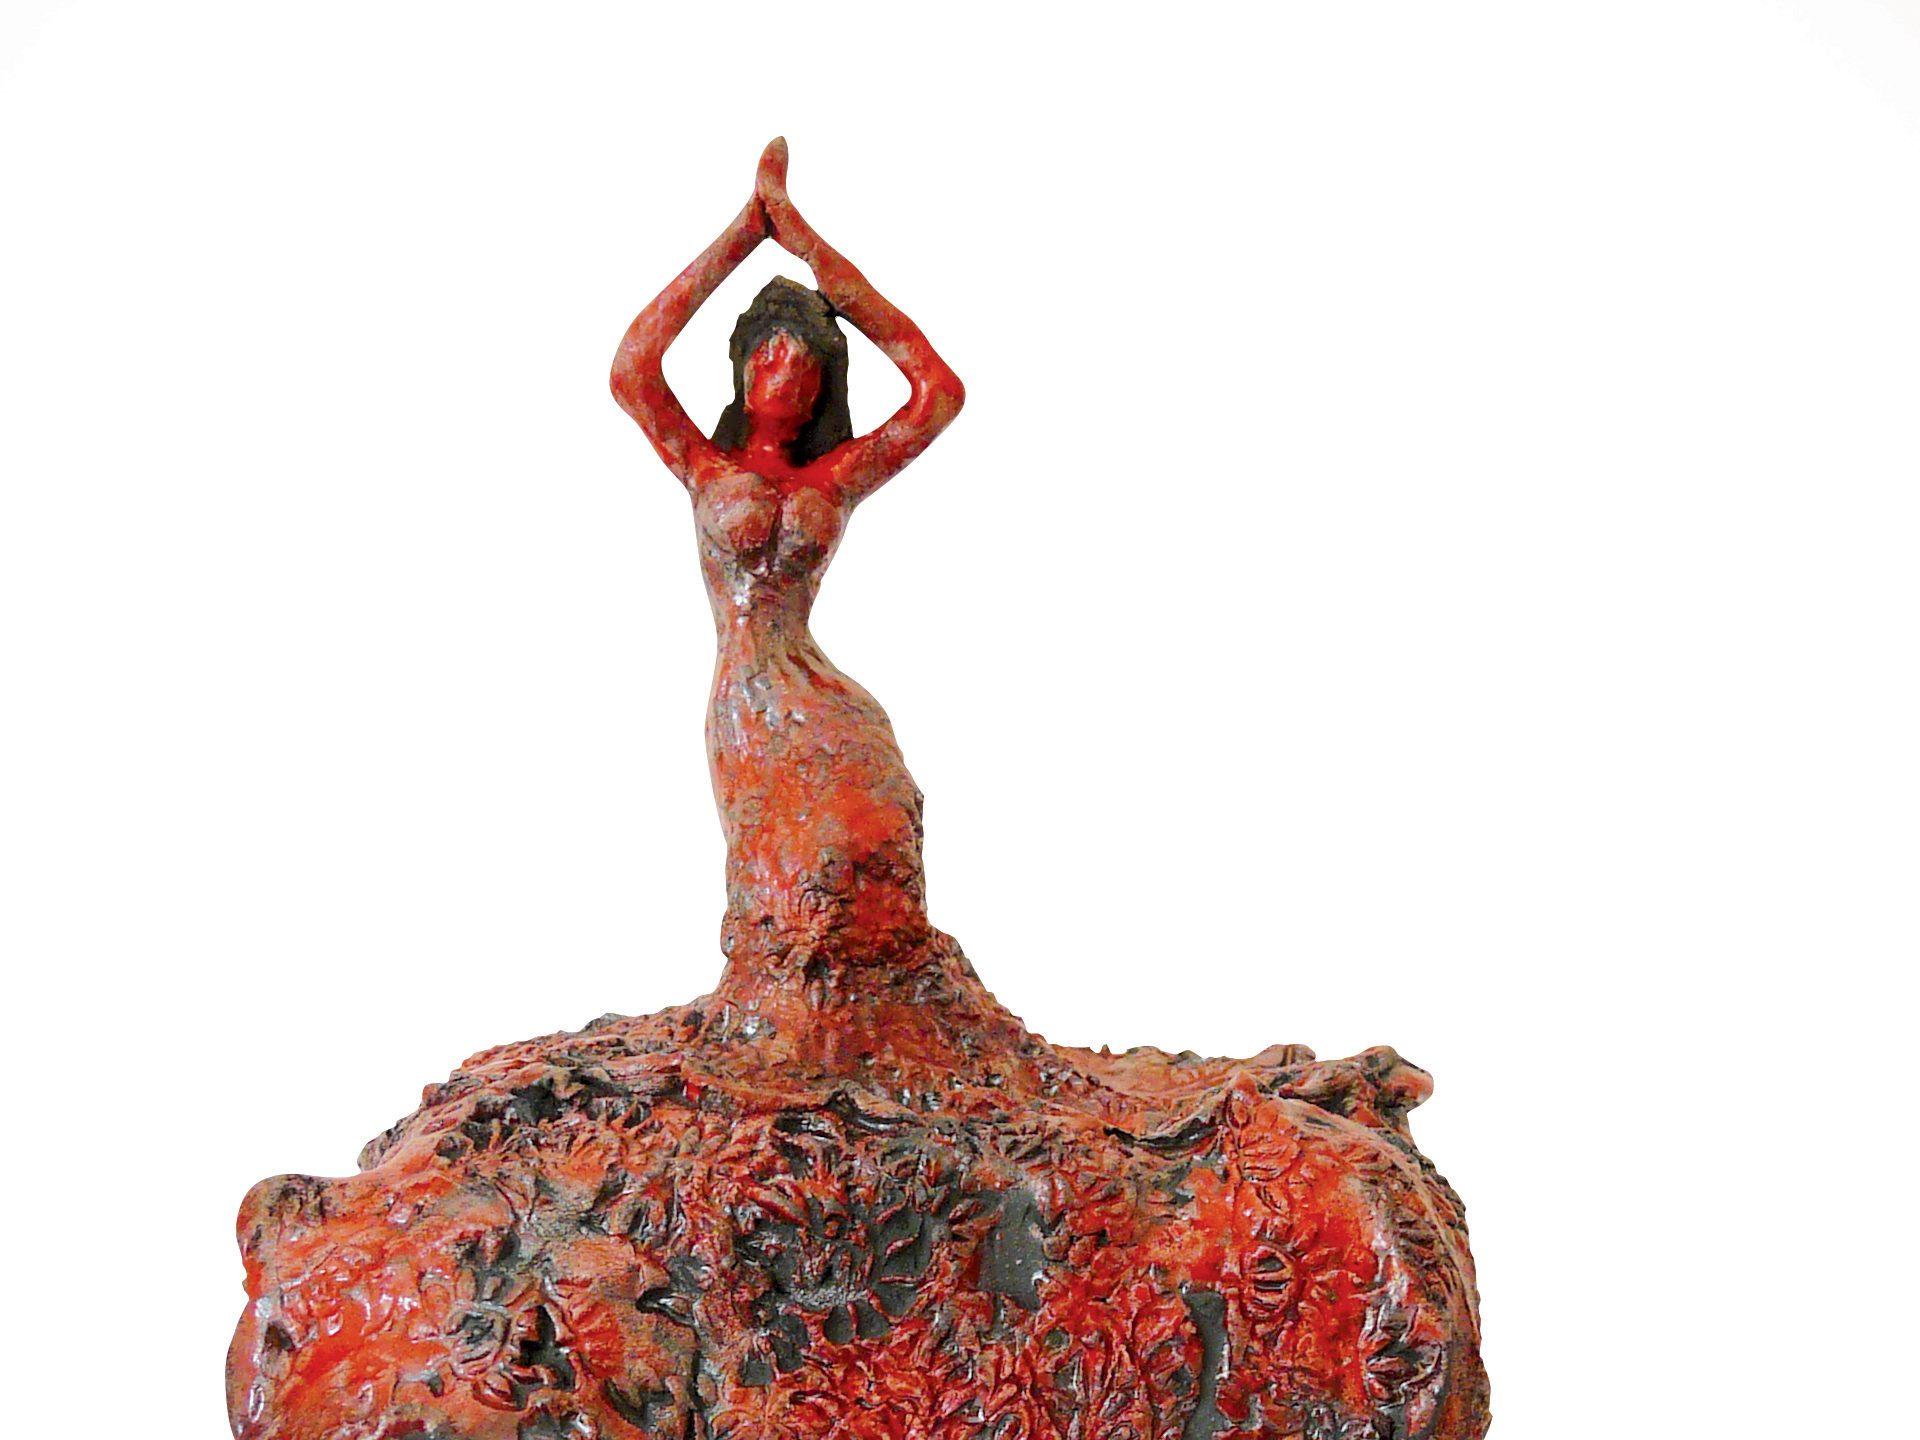 Vamos a bailar - Grès - Raku - Sculptures céramique de Florence Lemiegre